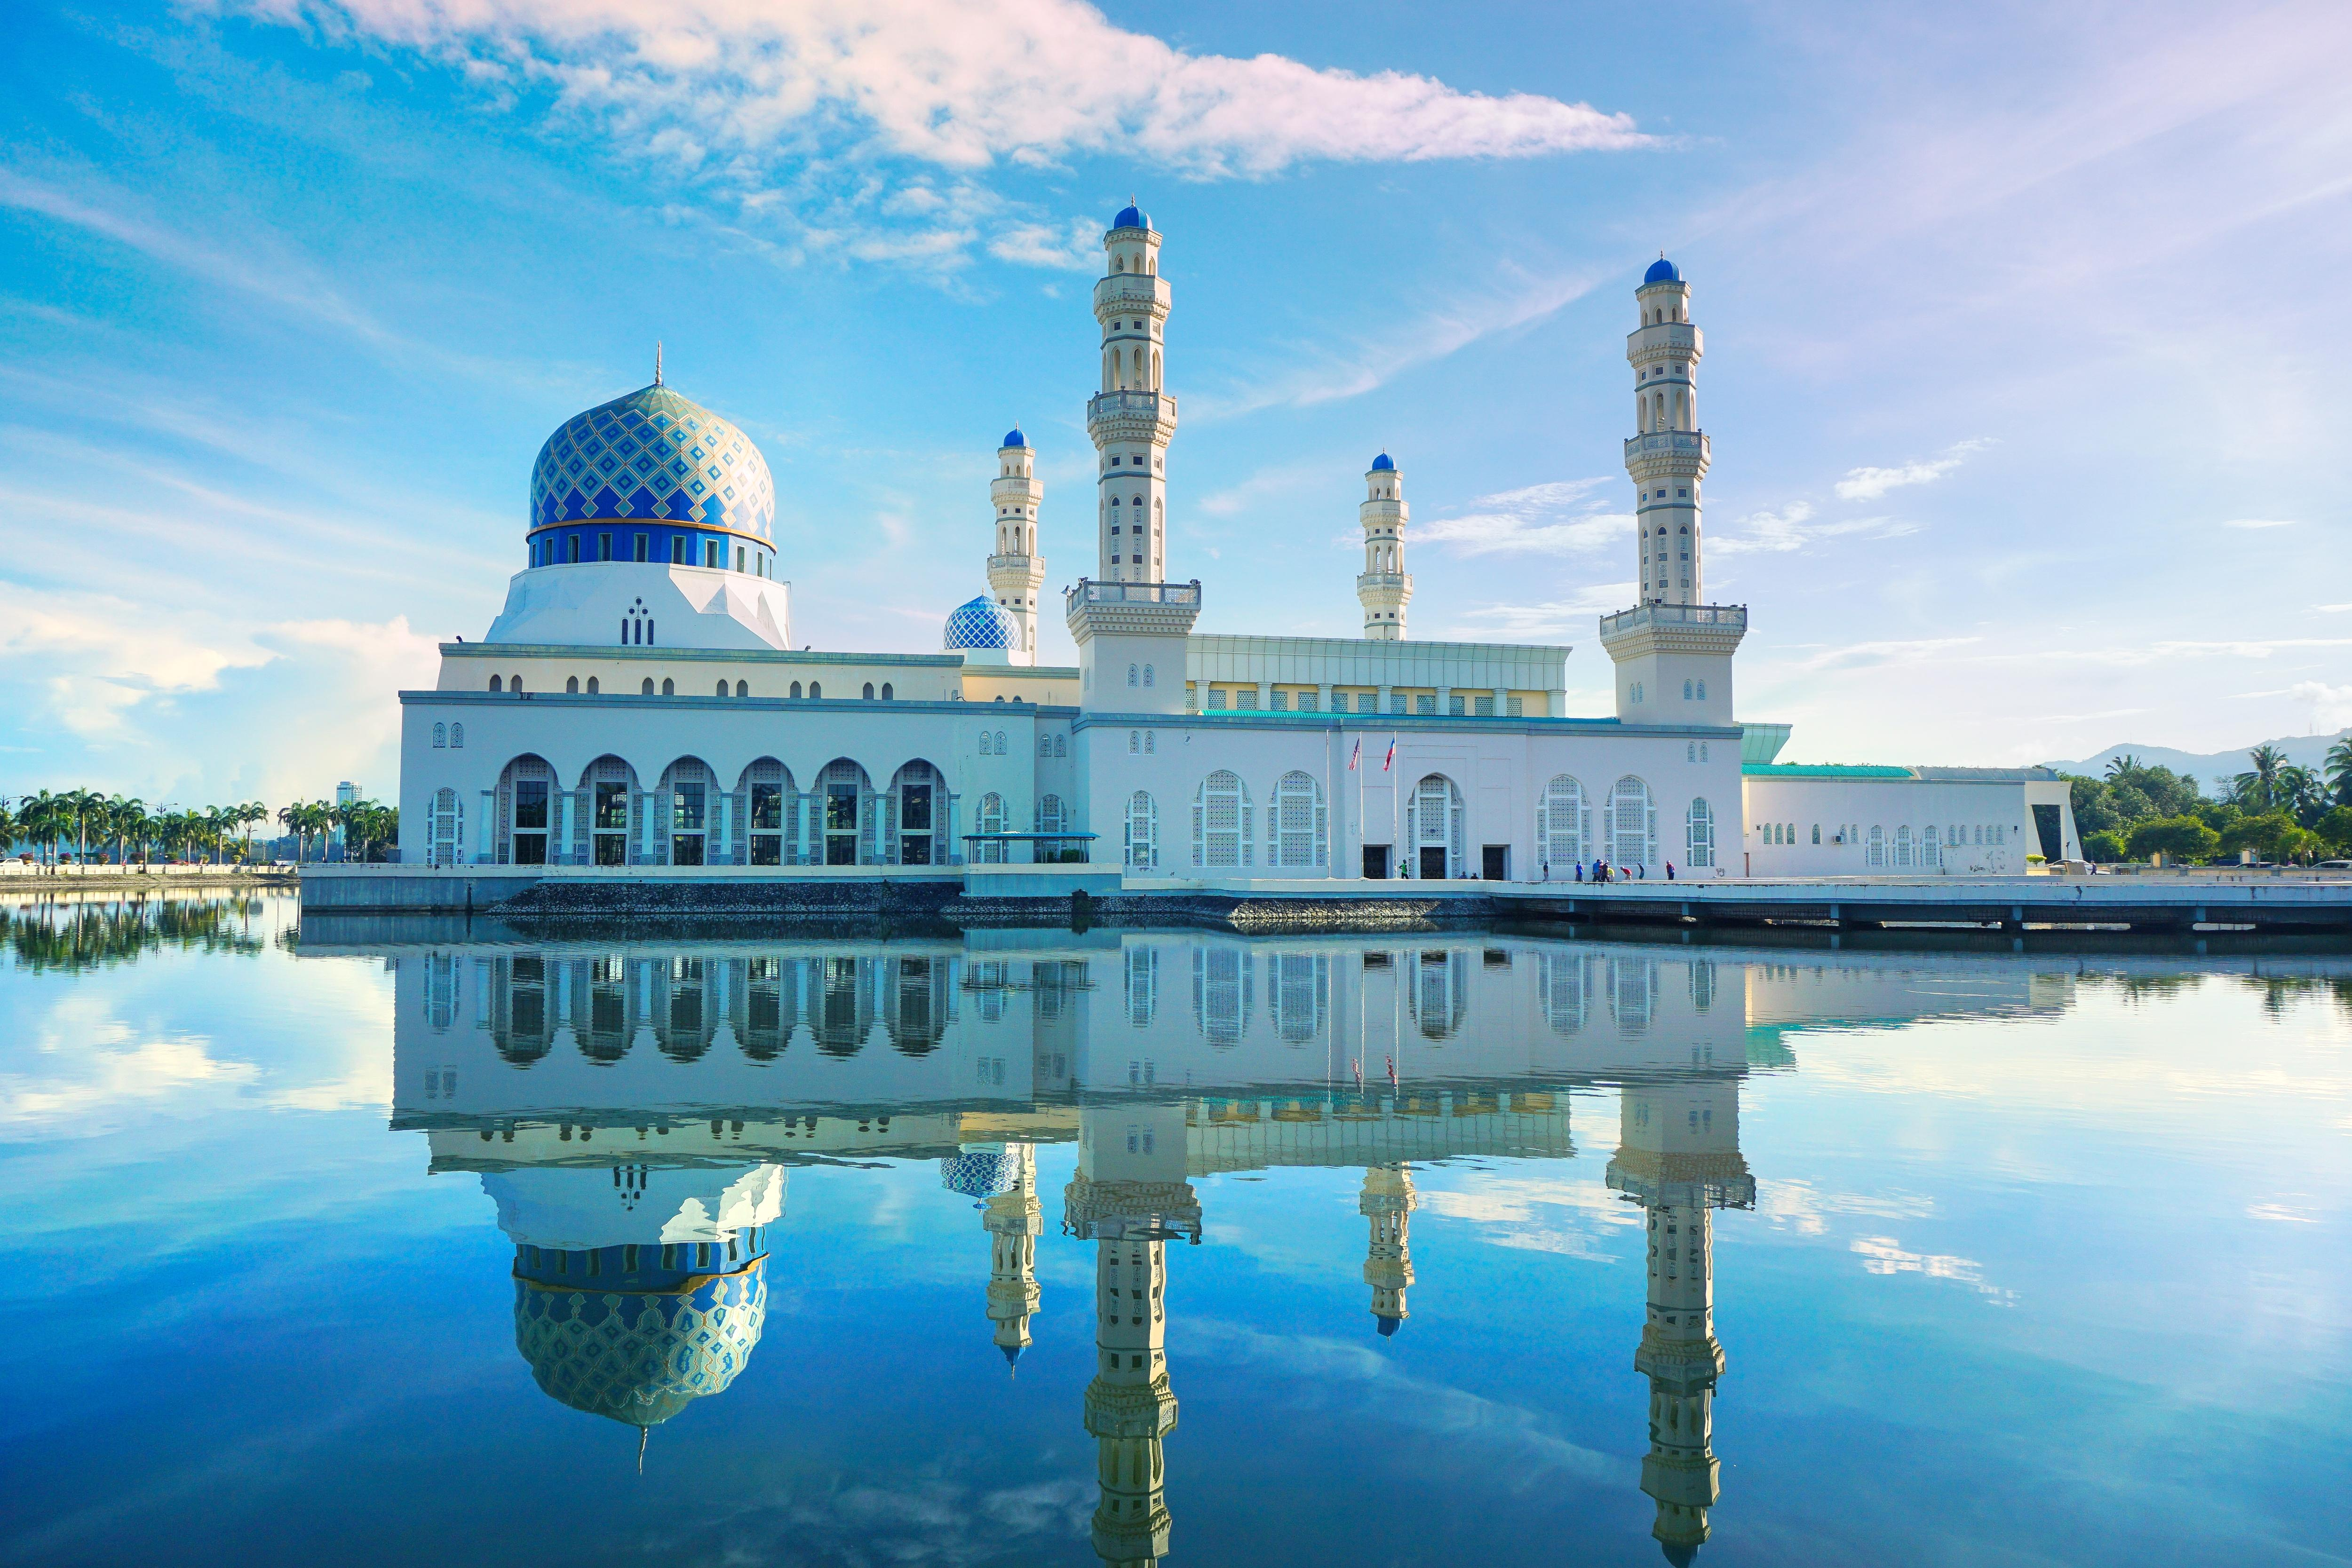 Blue Mosque (Masjid Sultan Salahuddin Abdul Aziz/Biru)